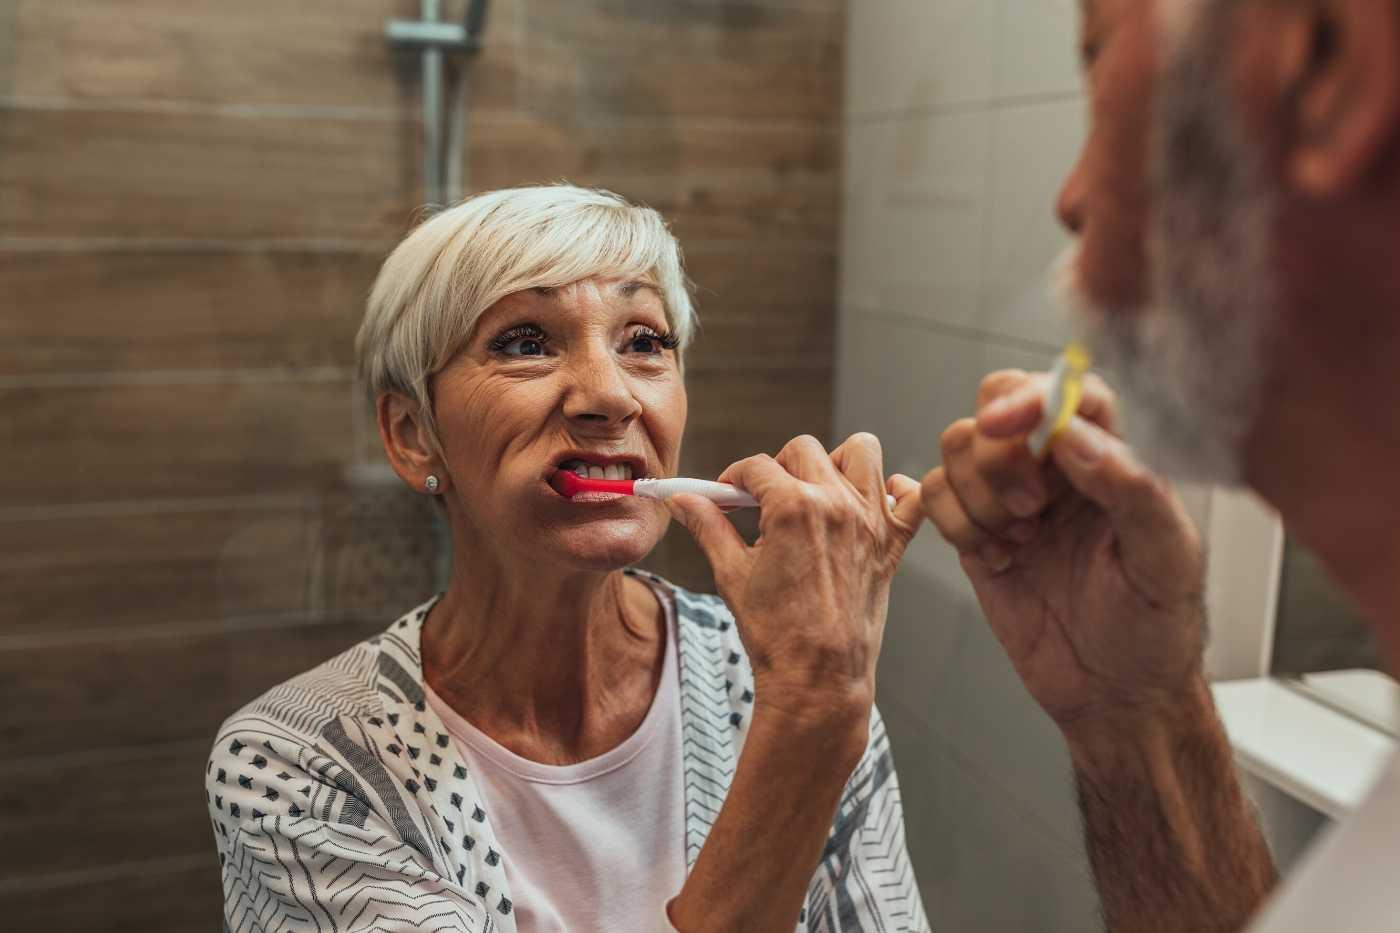 Two older adults practicing good dental hygiene